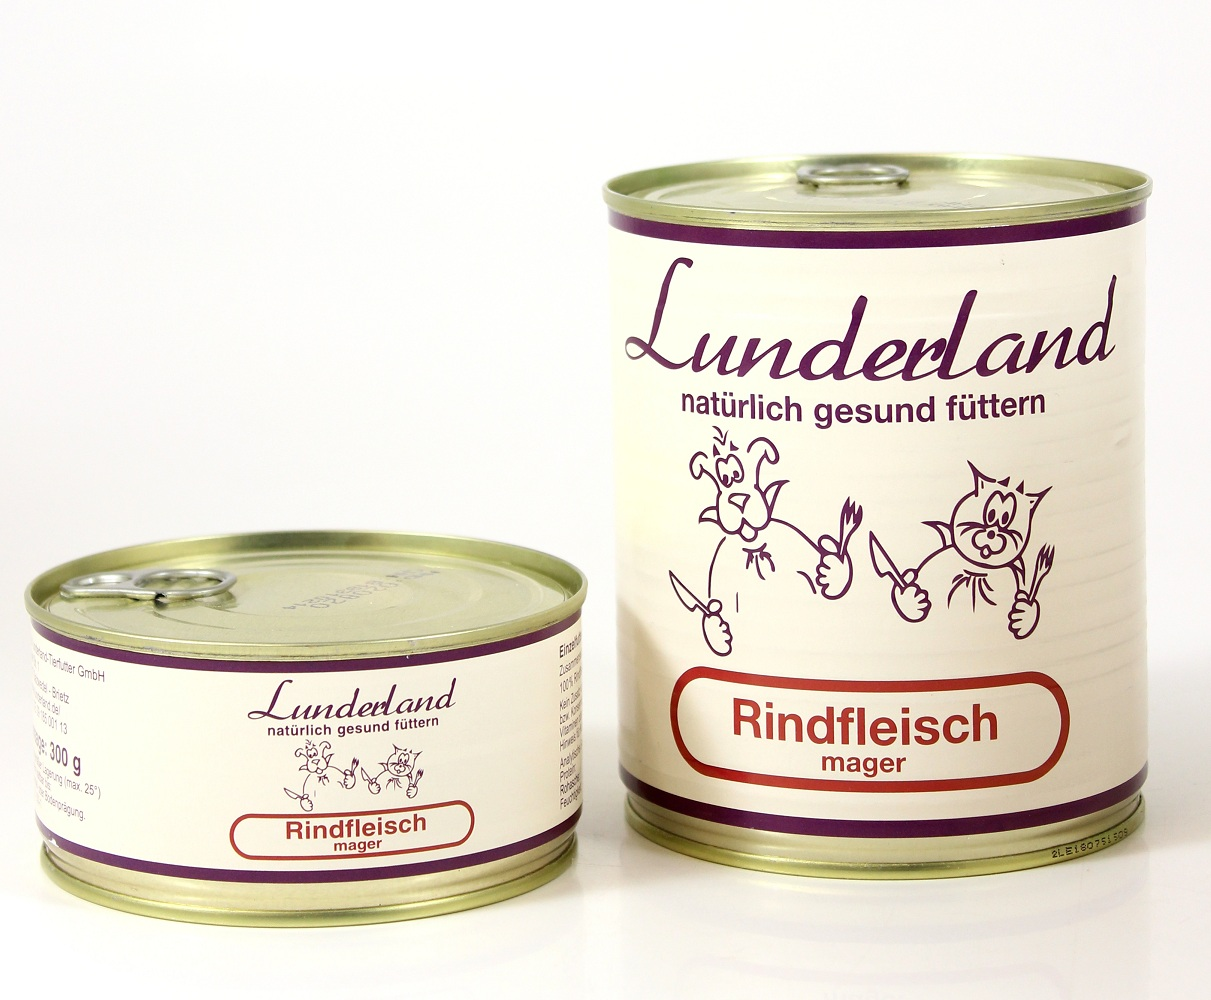 lunderland rindfleisch mager g nstig online bestellen. Black Bedroom Furniture Sets. Home Design Ideas